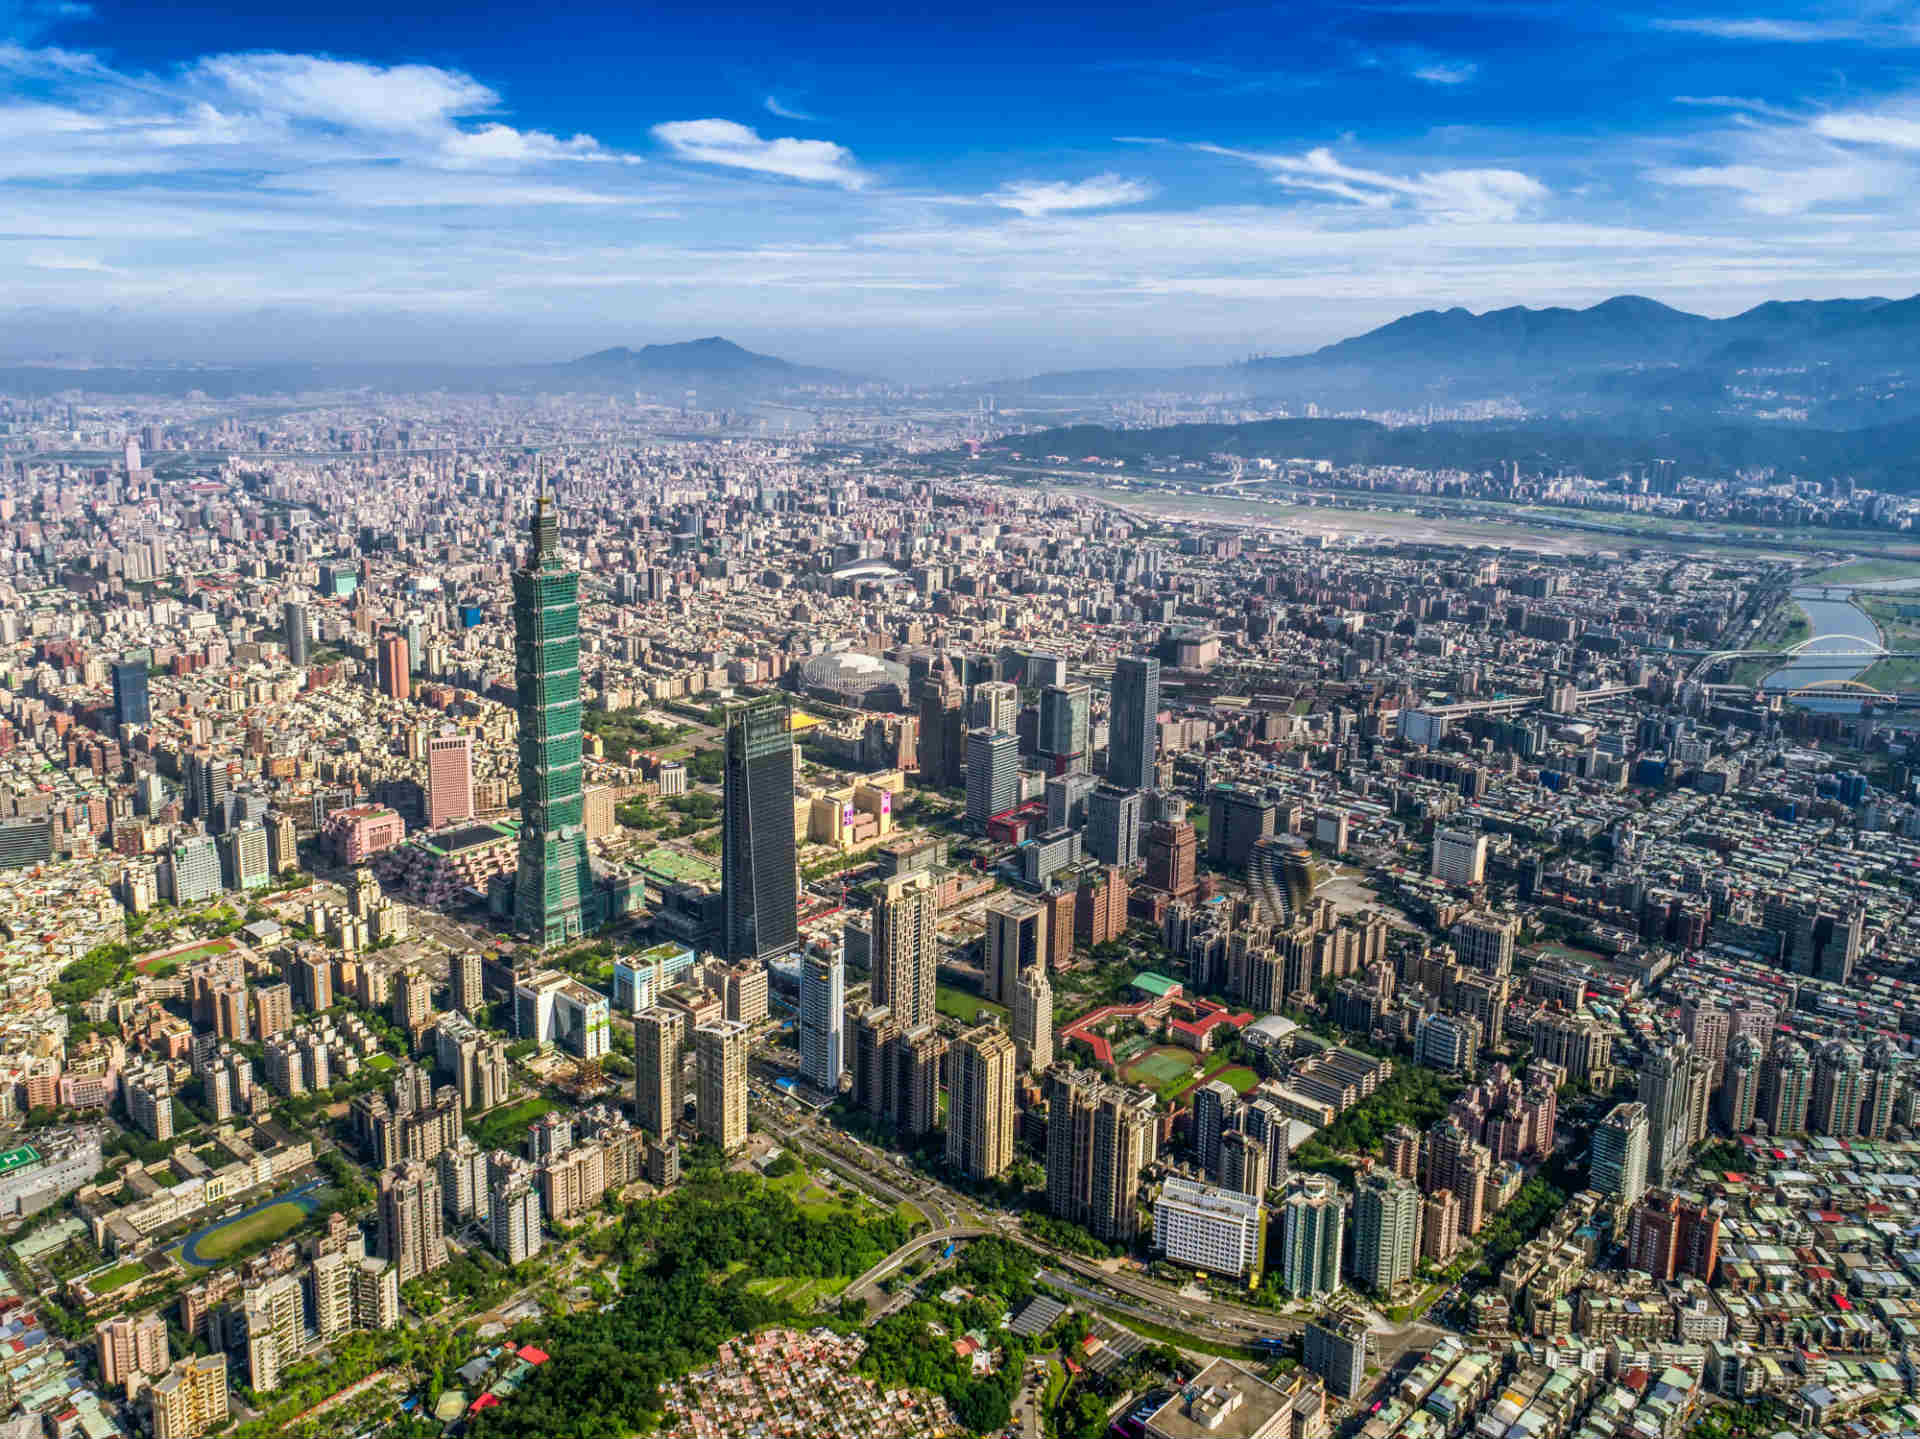 Top 10 Instagrammable Spot in Taipei